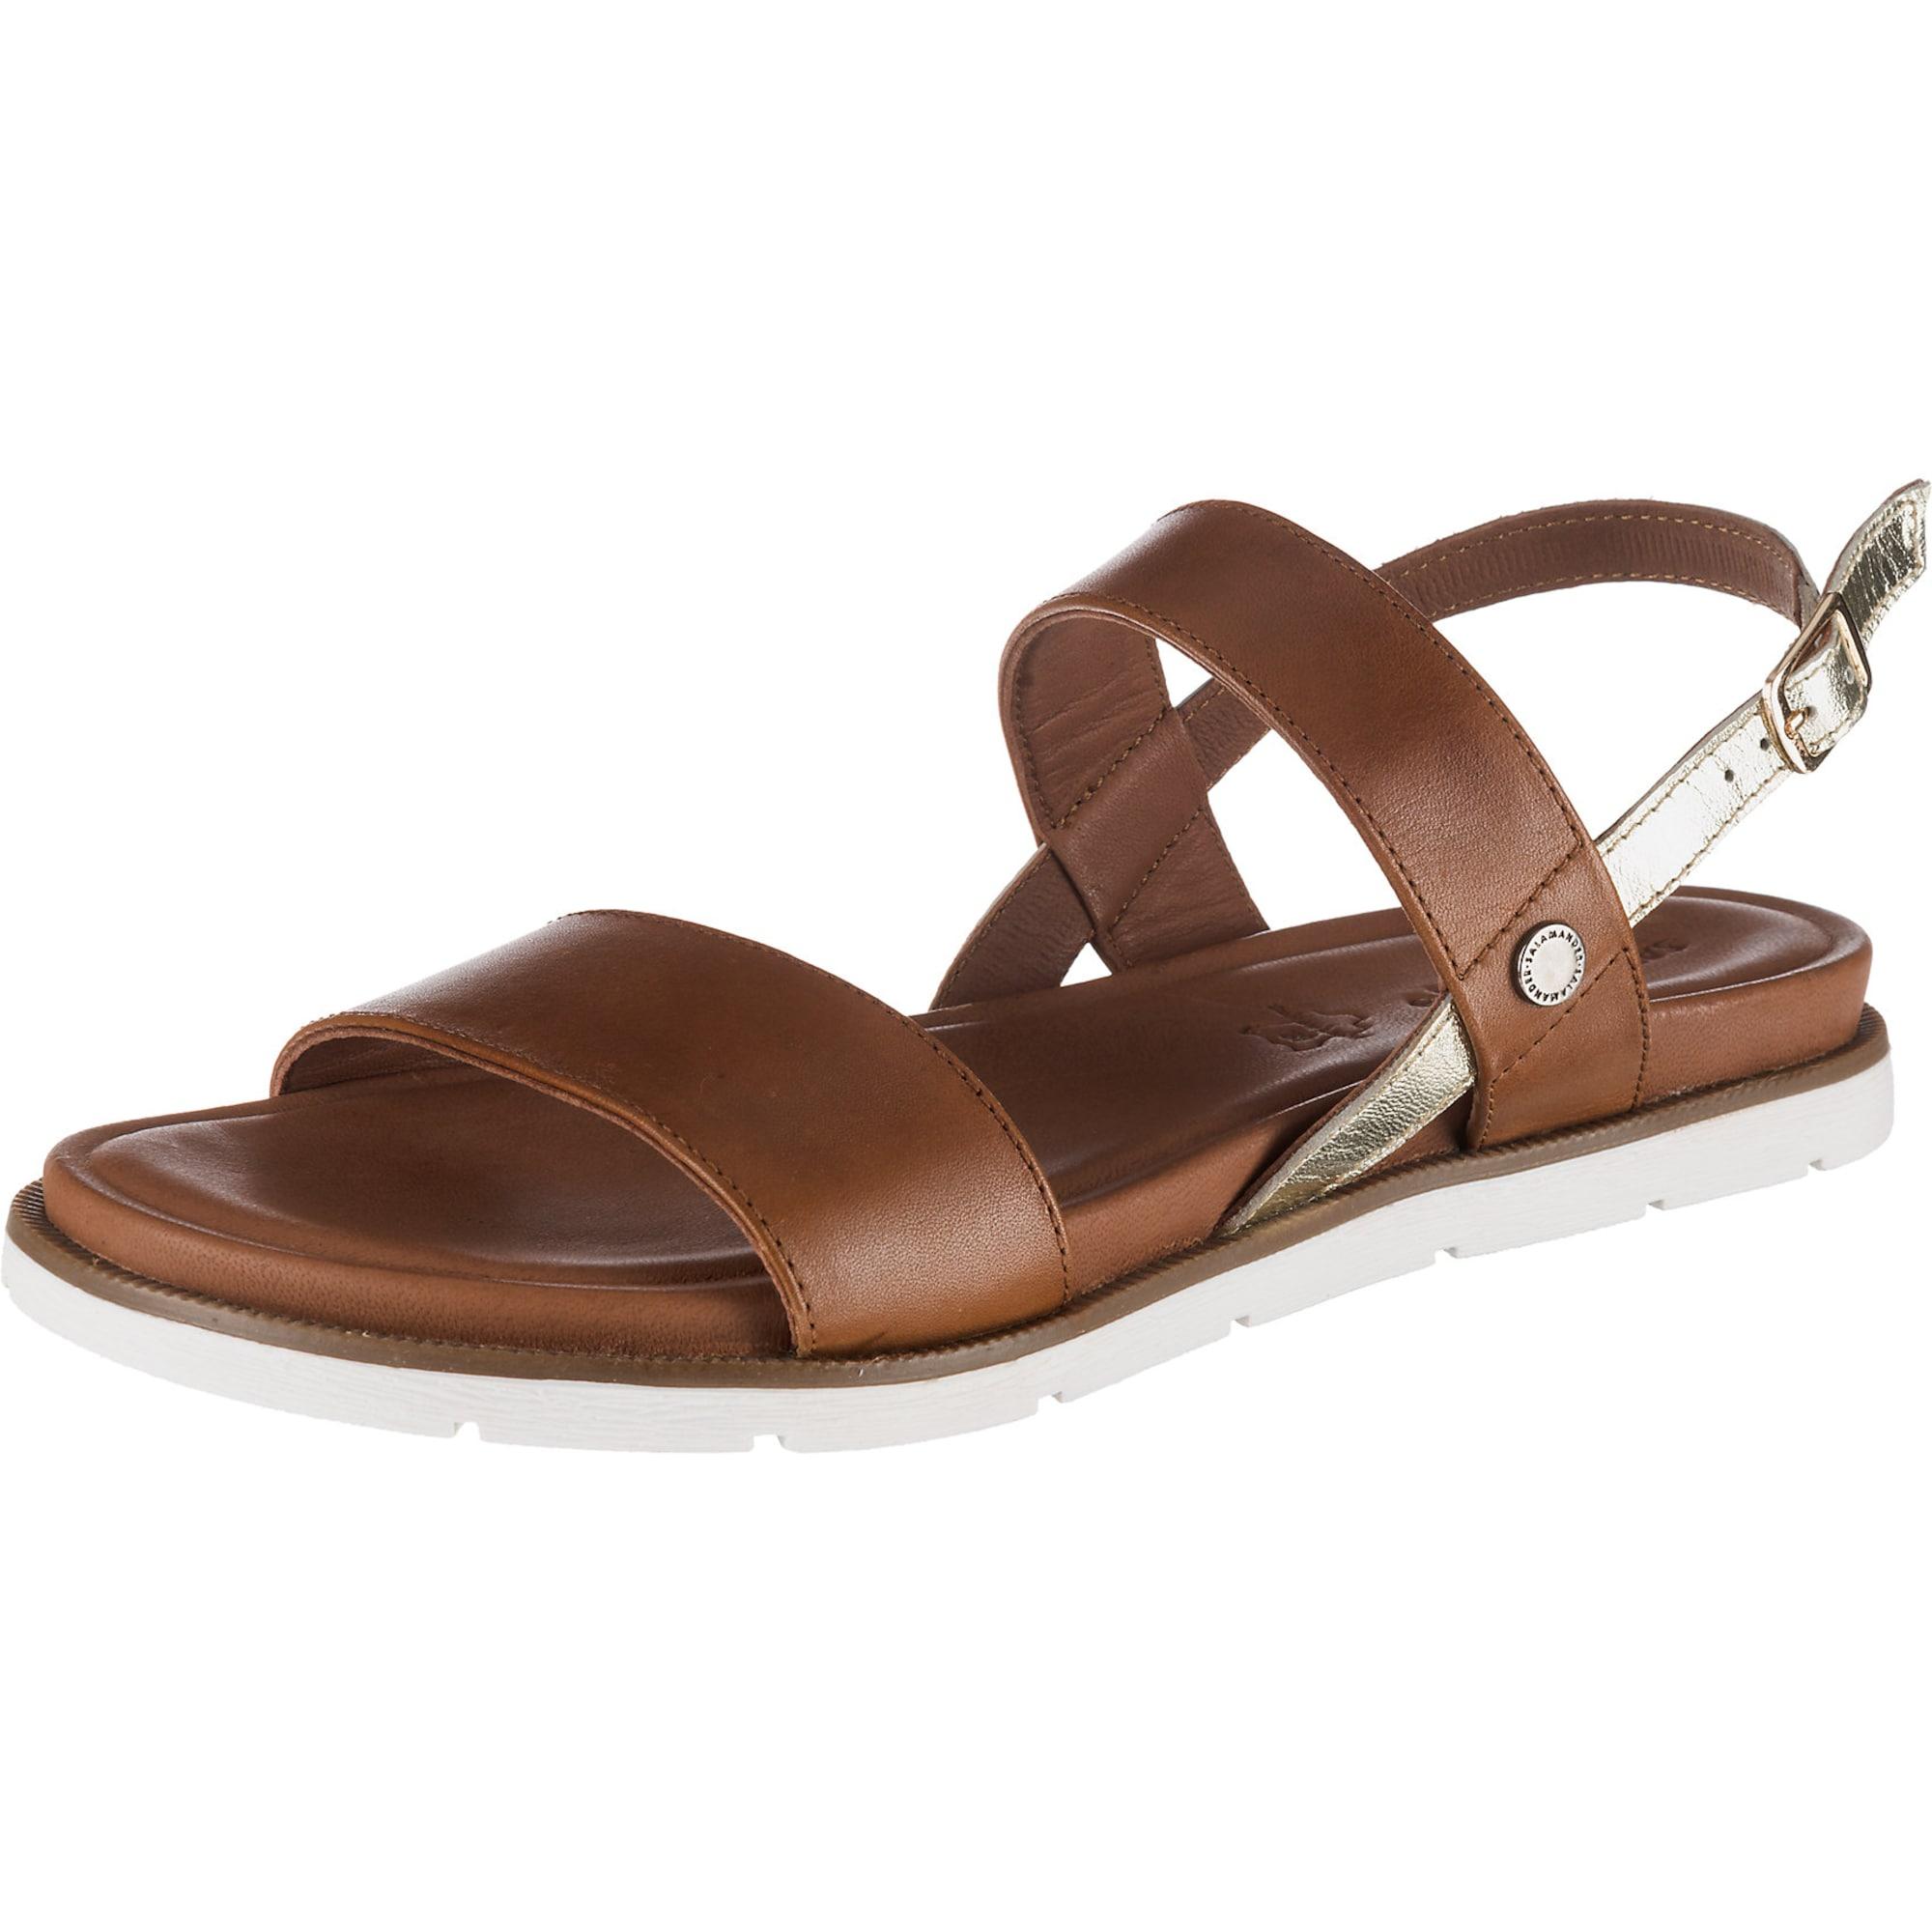 Sandalen 'Musy' | Schuhe > Sandalen & Zehentrenner | Braun - Silber | SALAMANDER